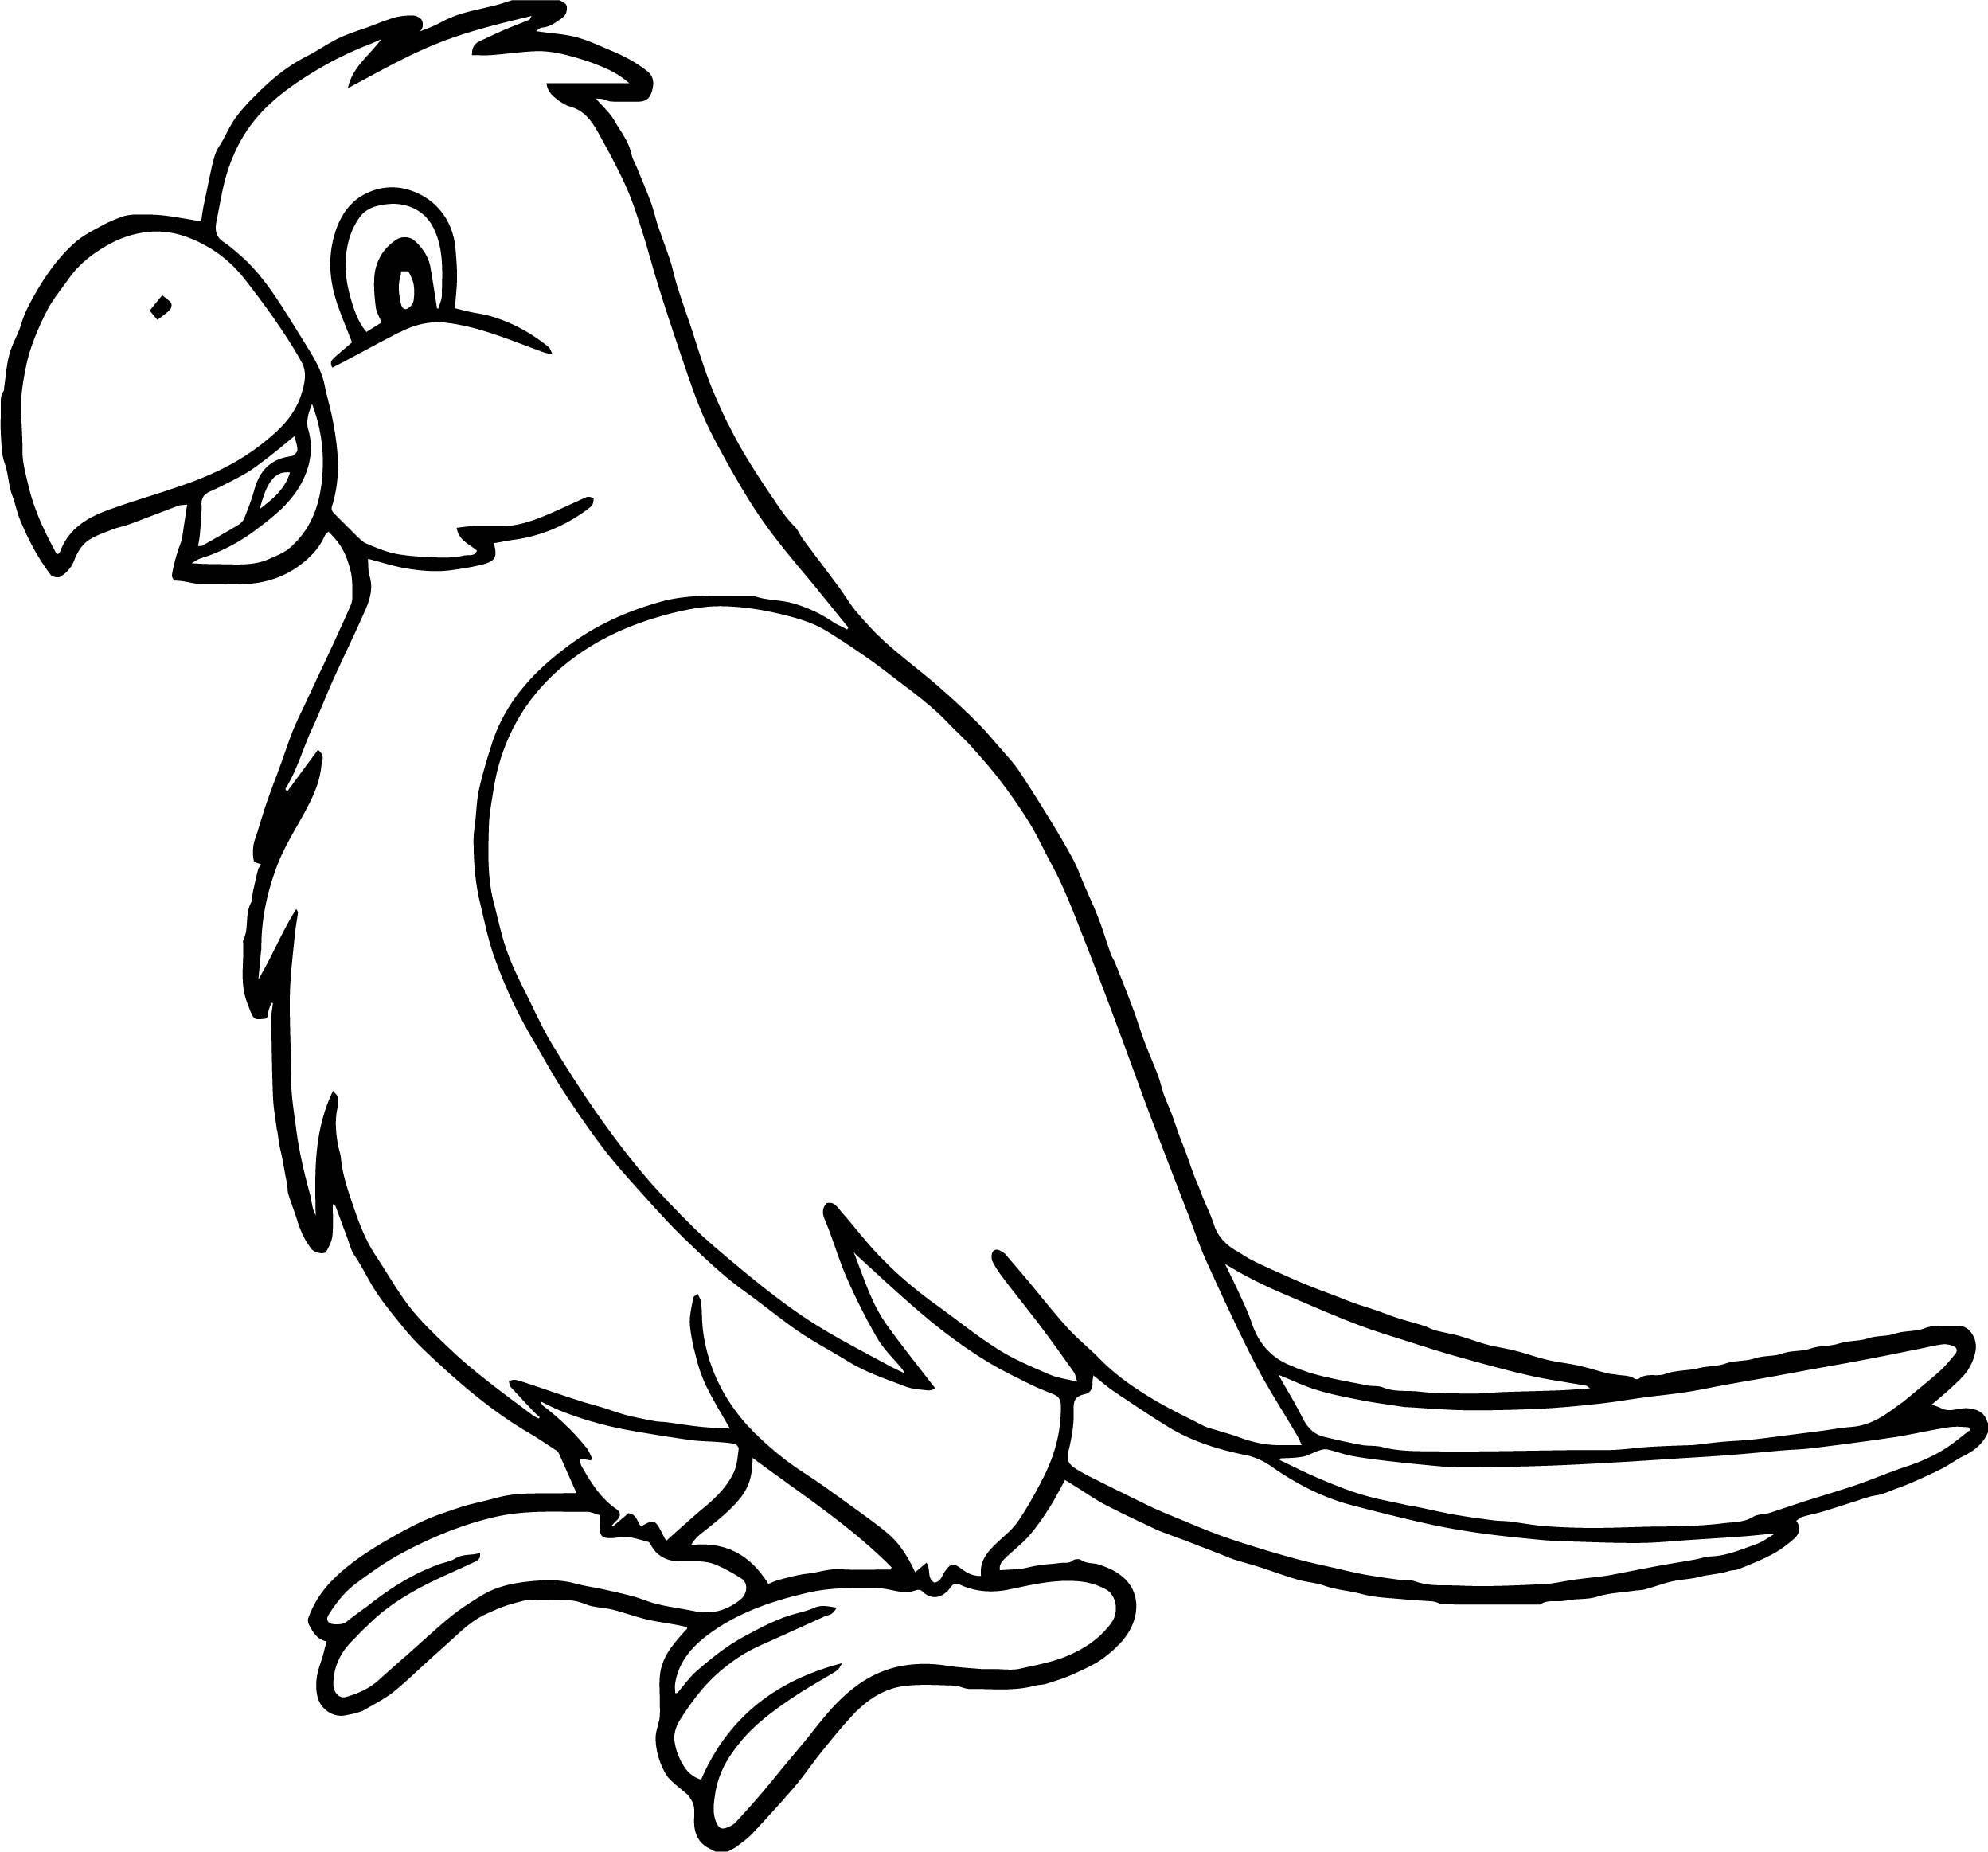 Coloring Page Of Bluebirds Cute Cartoon Bluebird Coloring Page